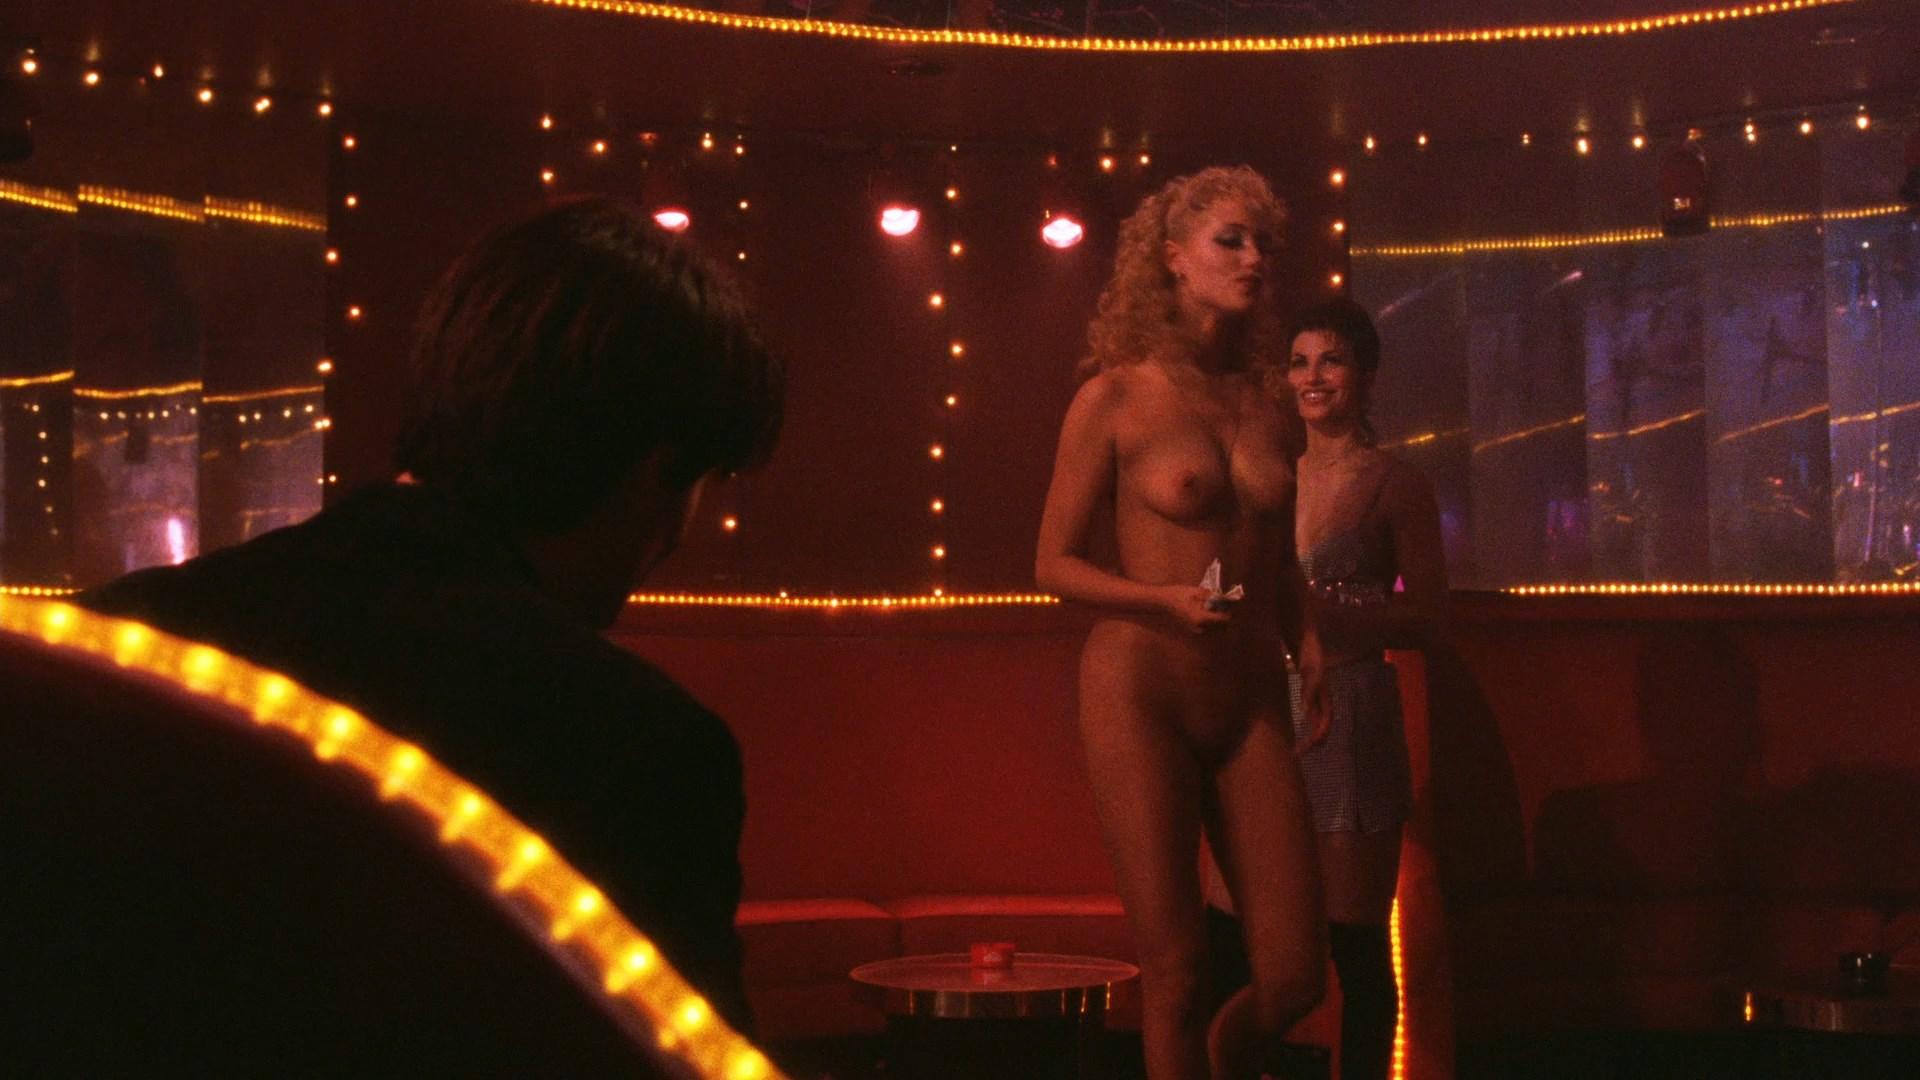 Gina Gershon Nude Scenes Erotic Galery